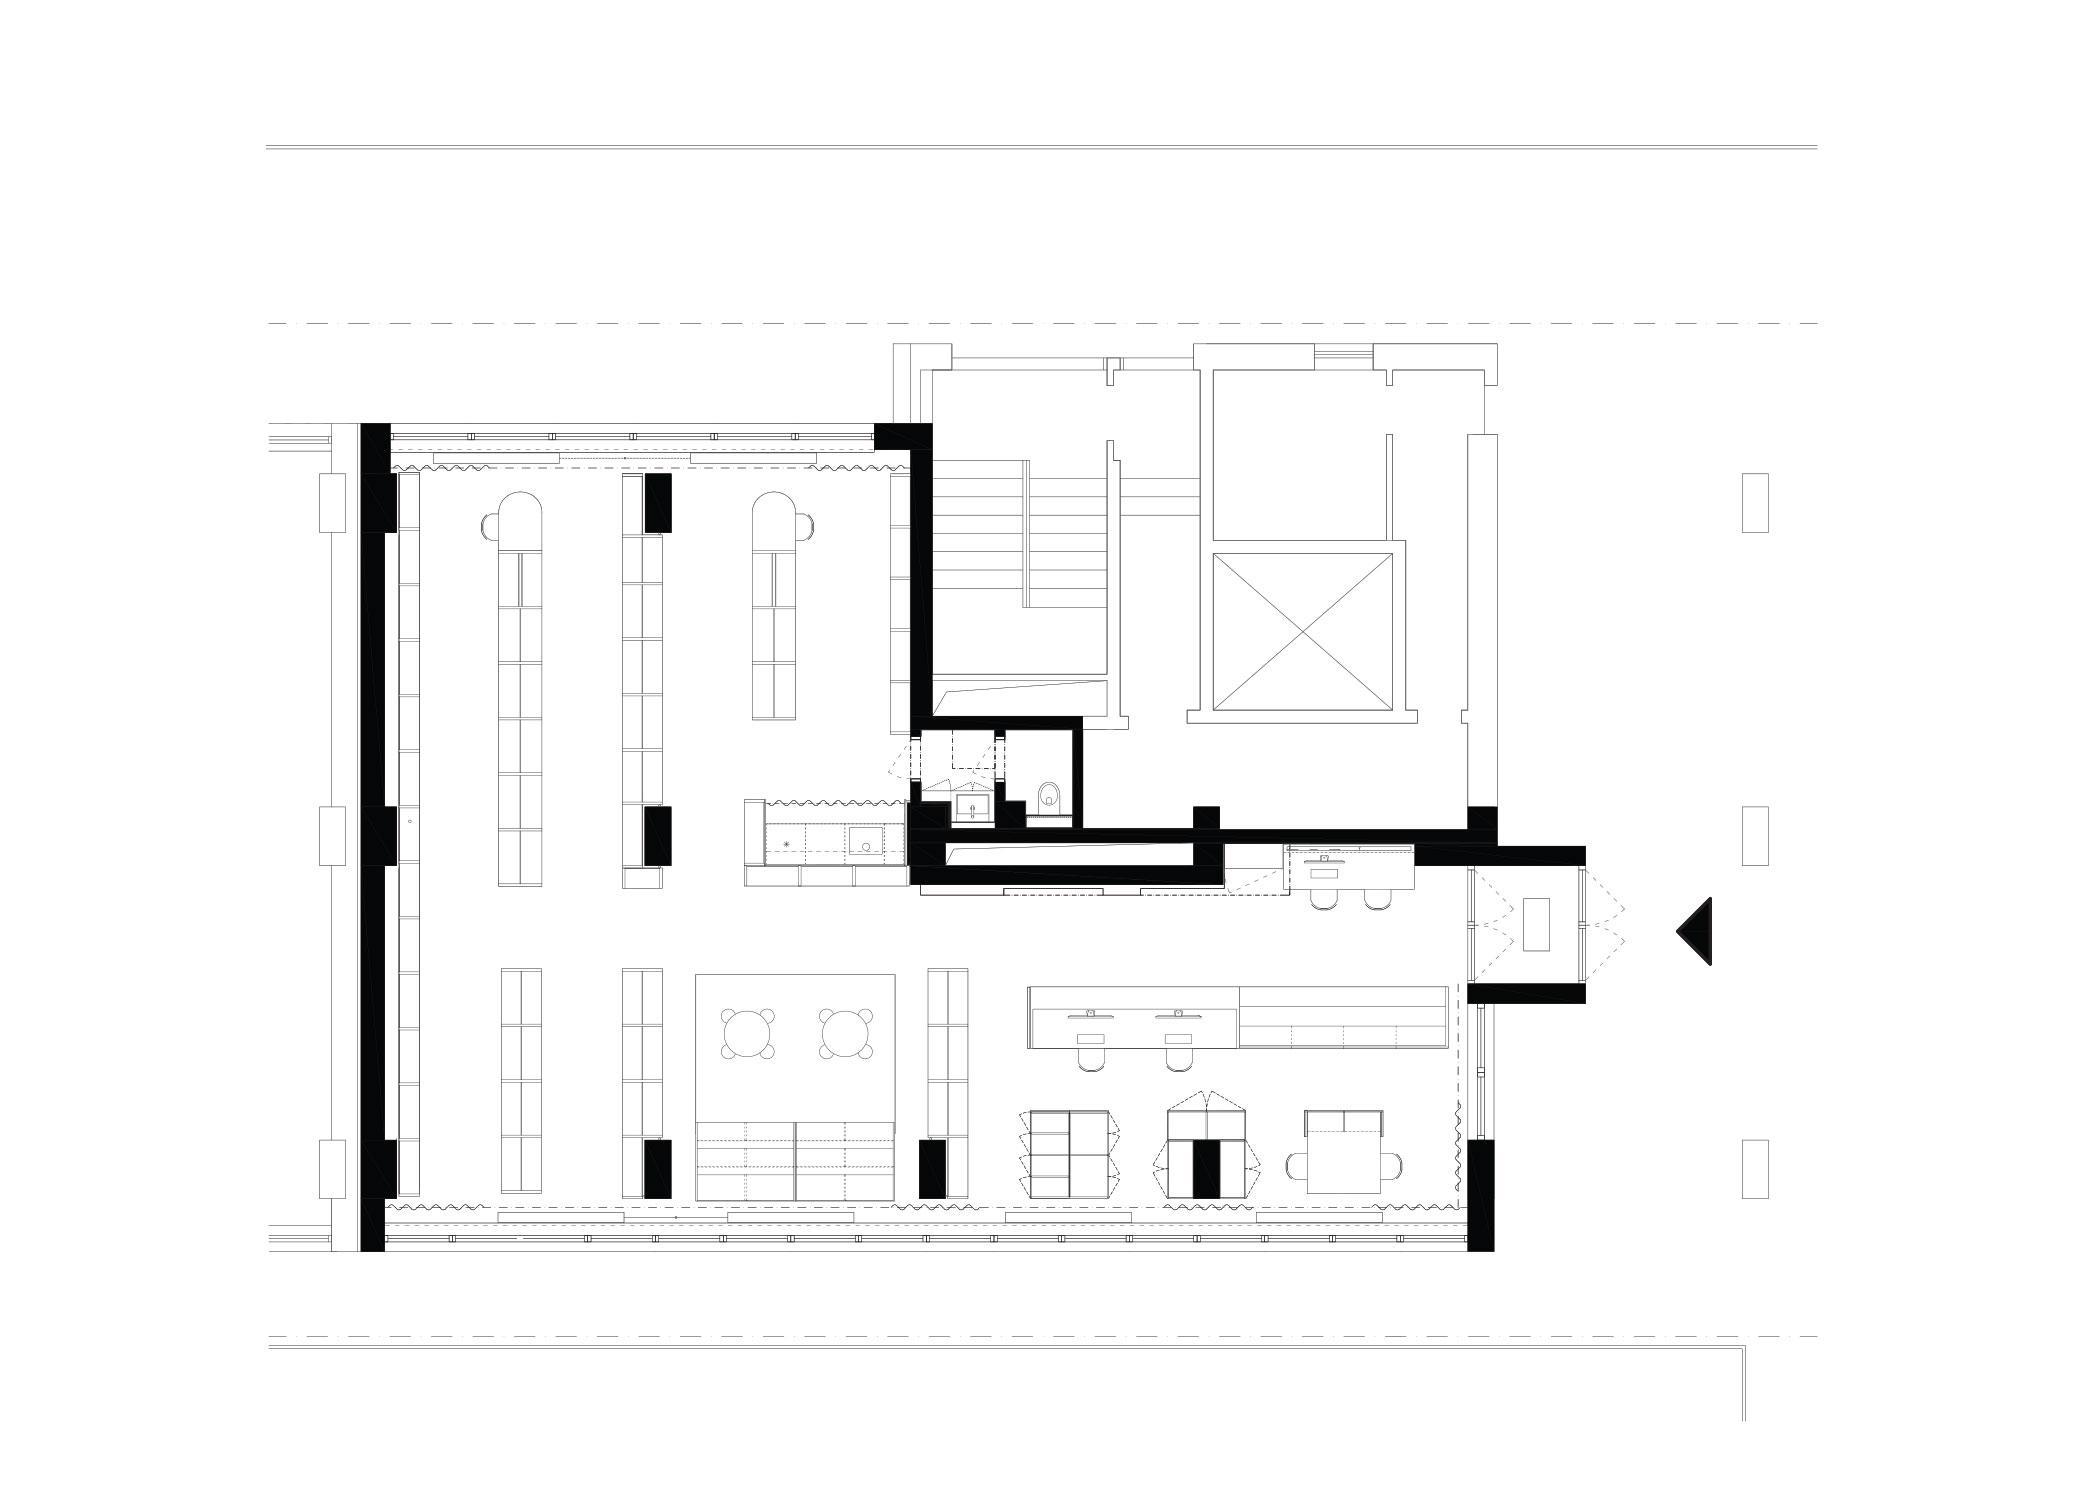 noiz-architekti-bratislava-kniznica-petrzalka-vavilovova-09